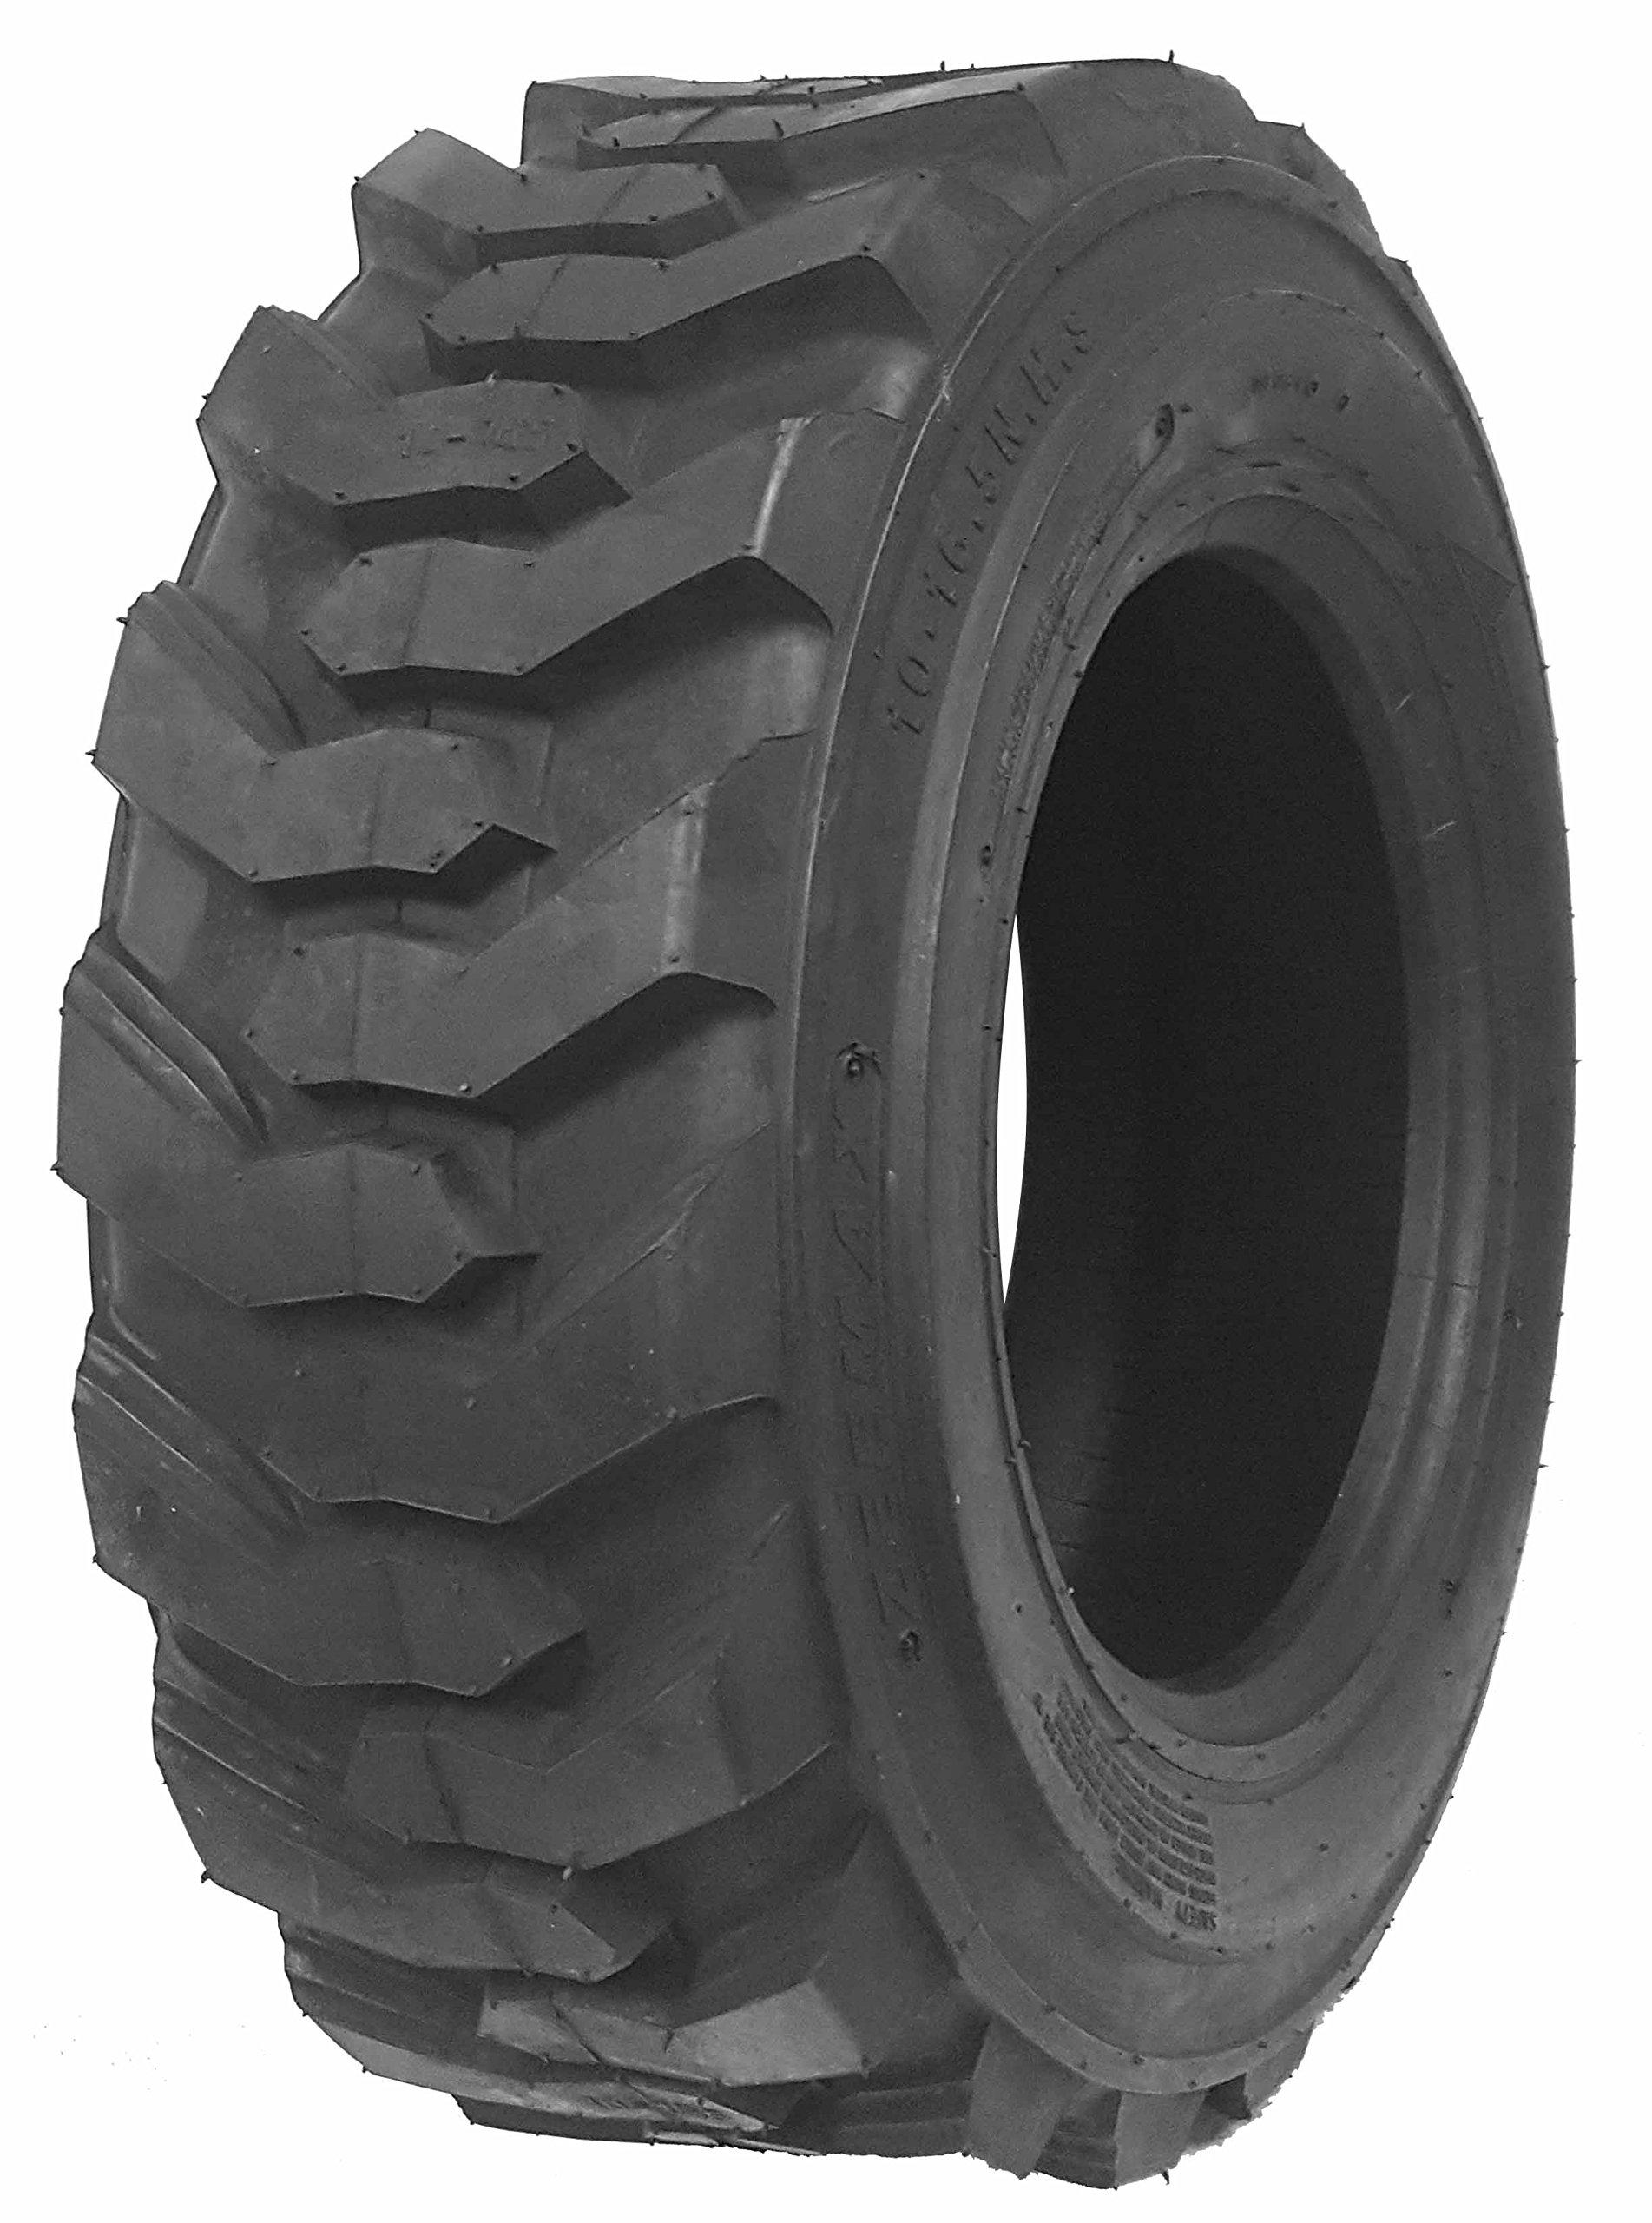 One New ZEEMAX Heavy Duty 10-16.5/10PR G2 Skid Steer Tire for Bobcat w/ Rim Guard